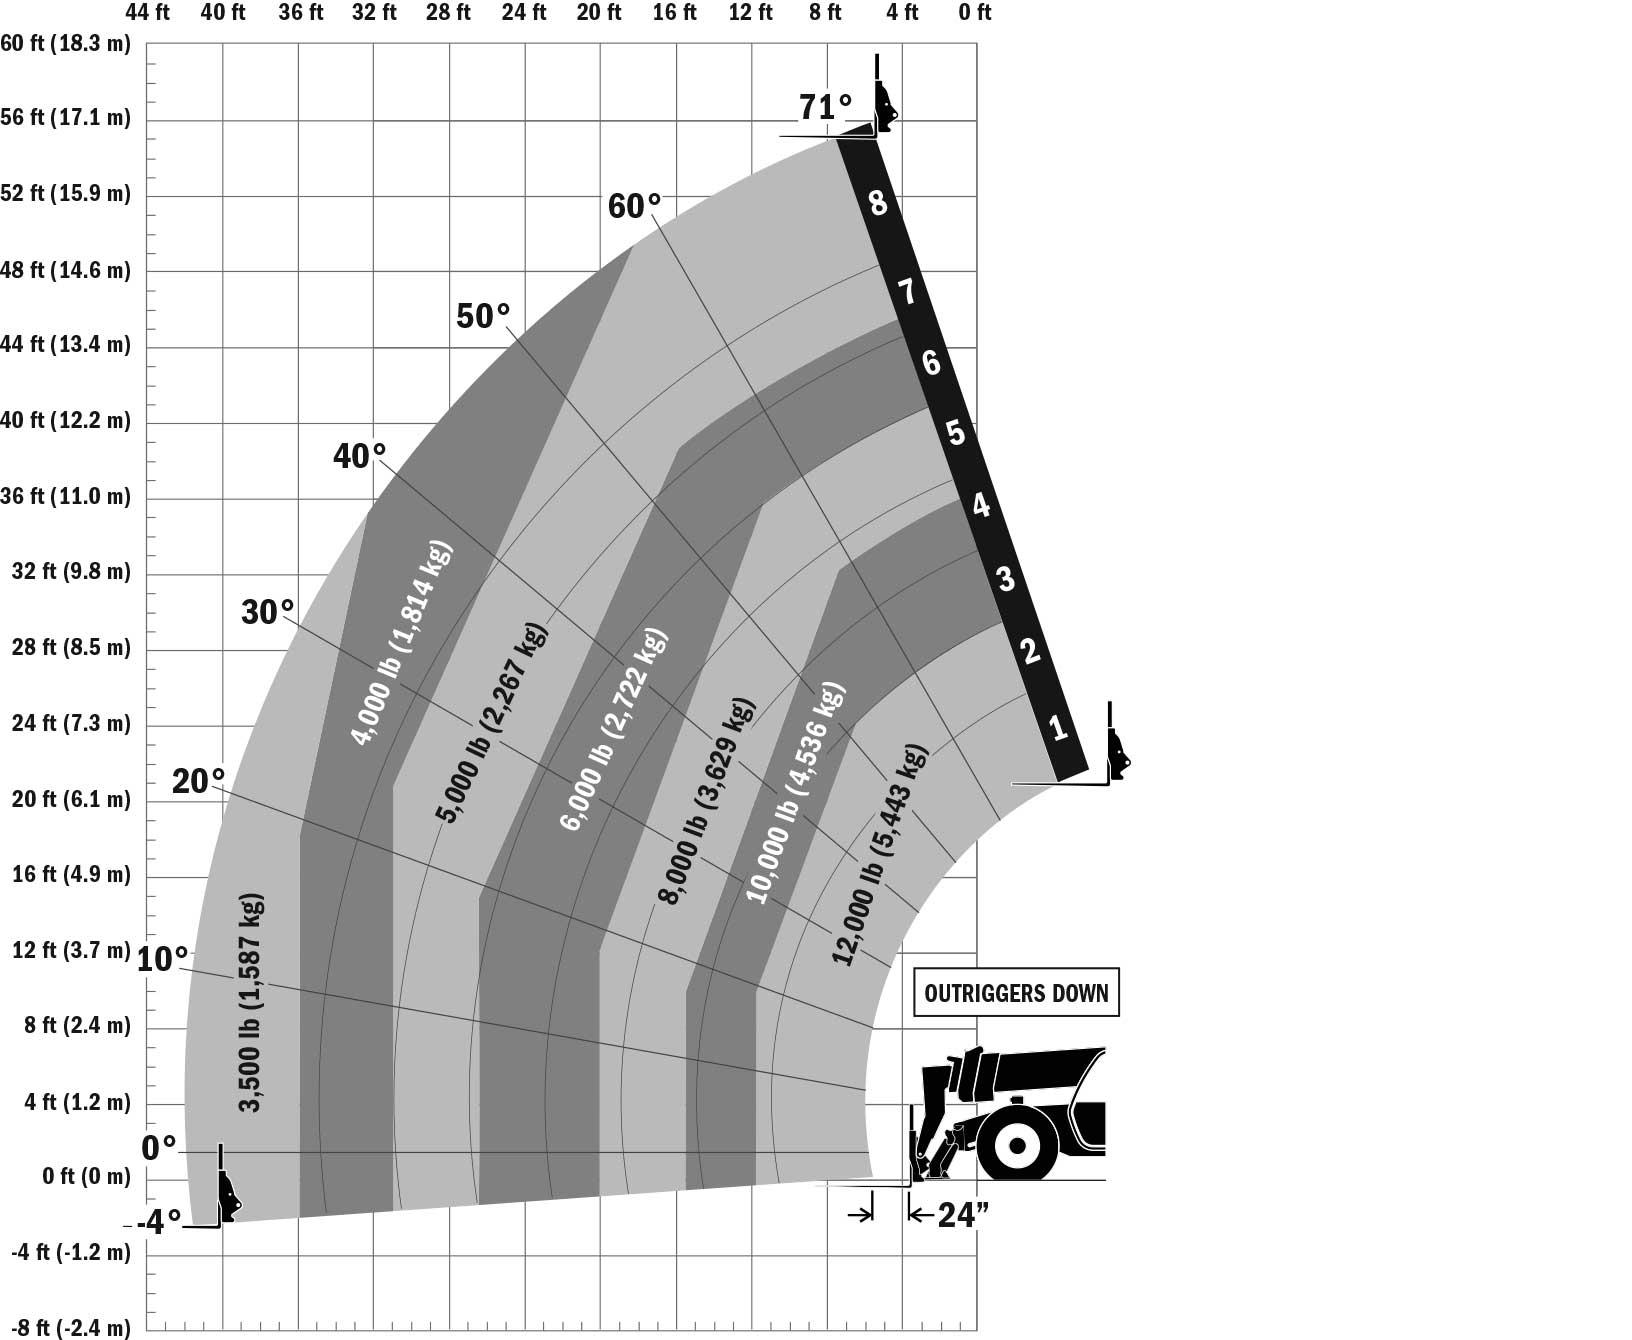 JLG 1255 Telehandler Load Chart Outrigger Down